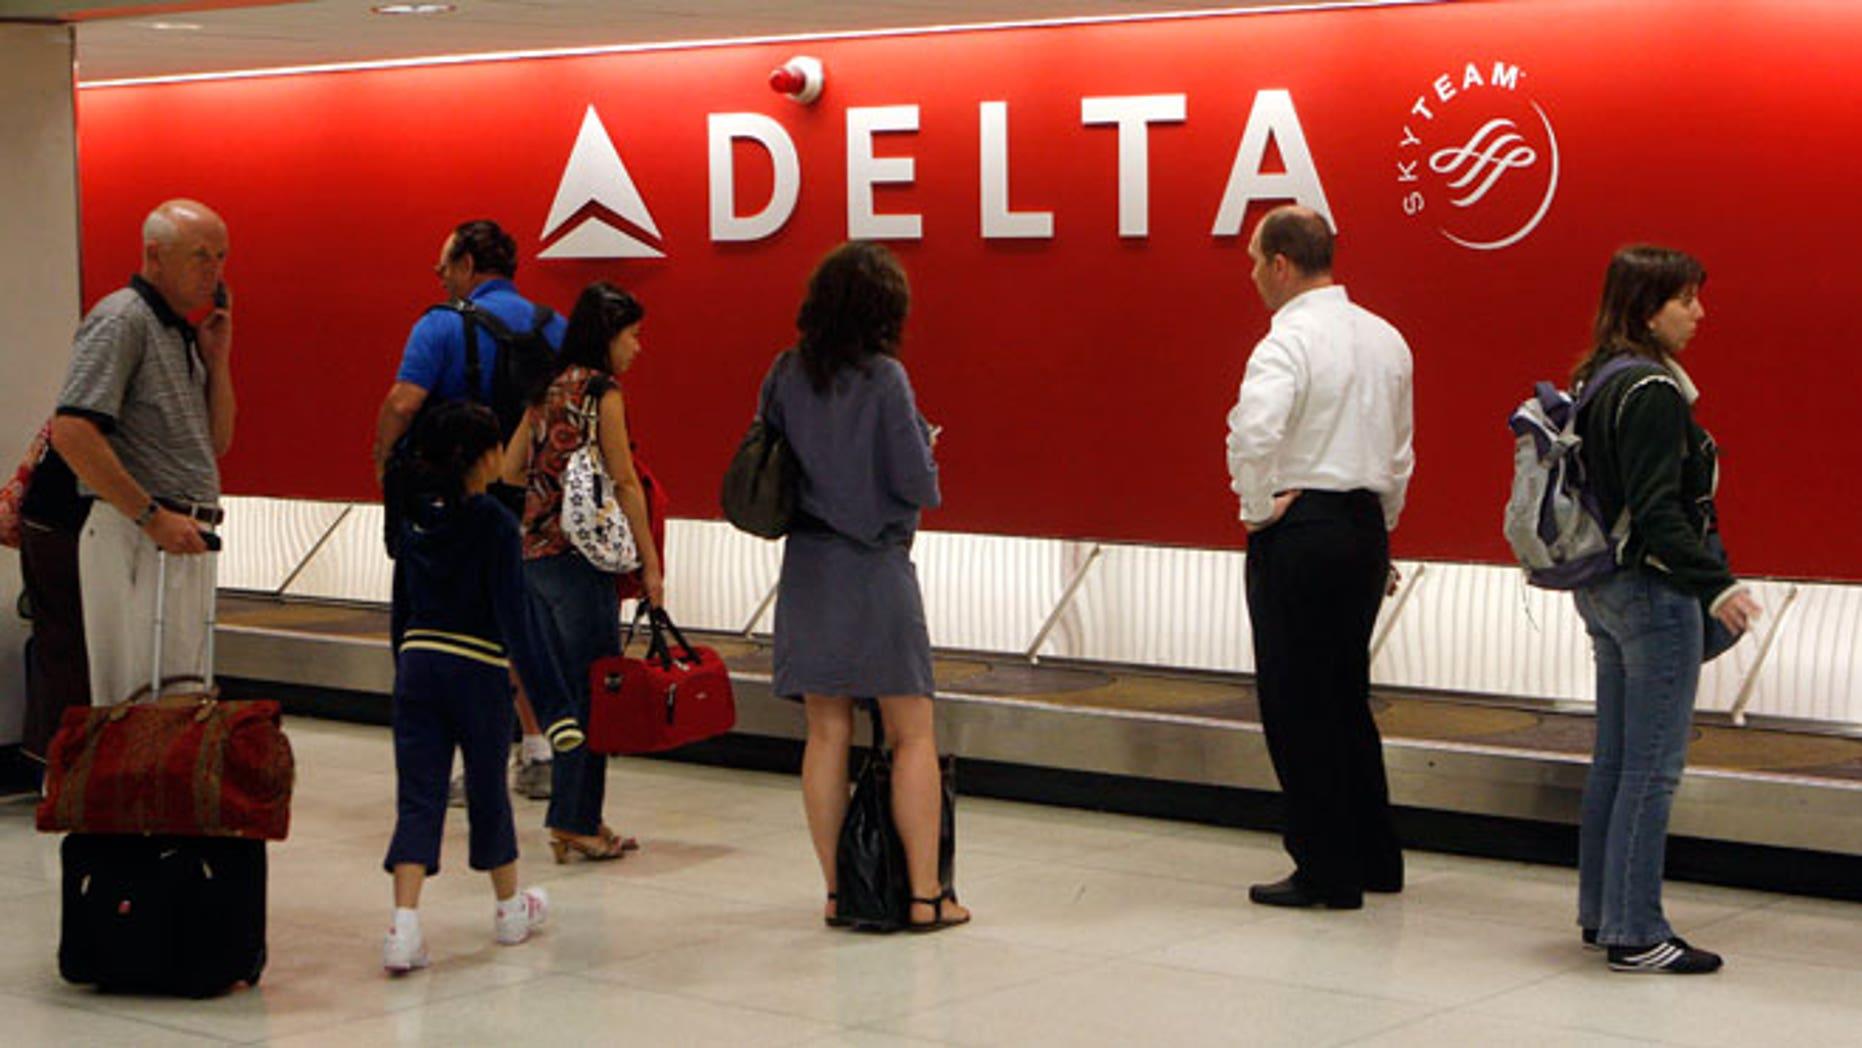 Delta Terminal 3, JFK Airport